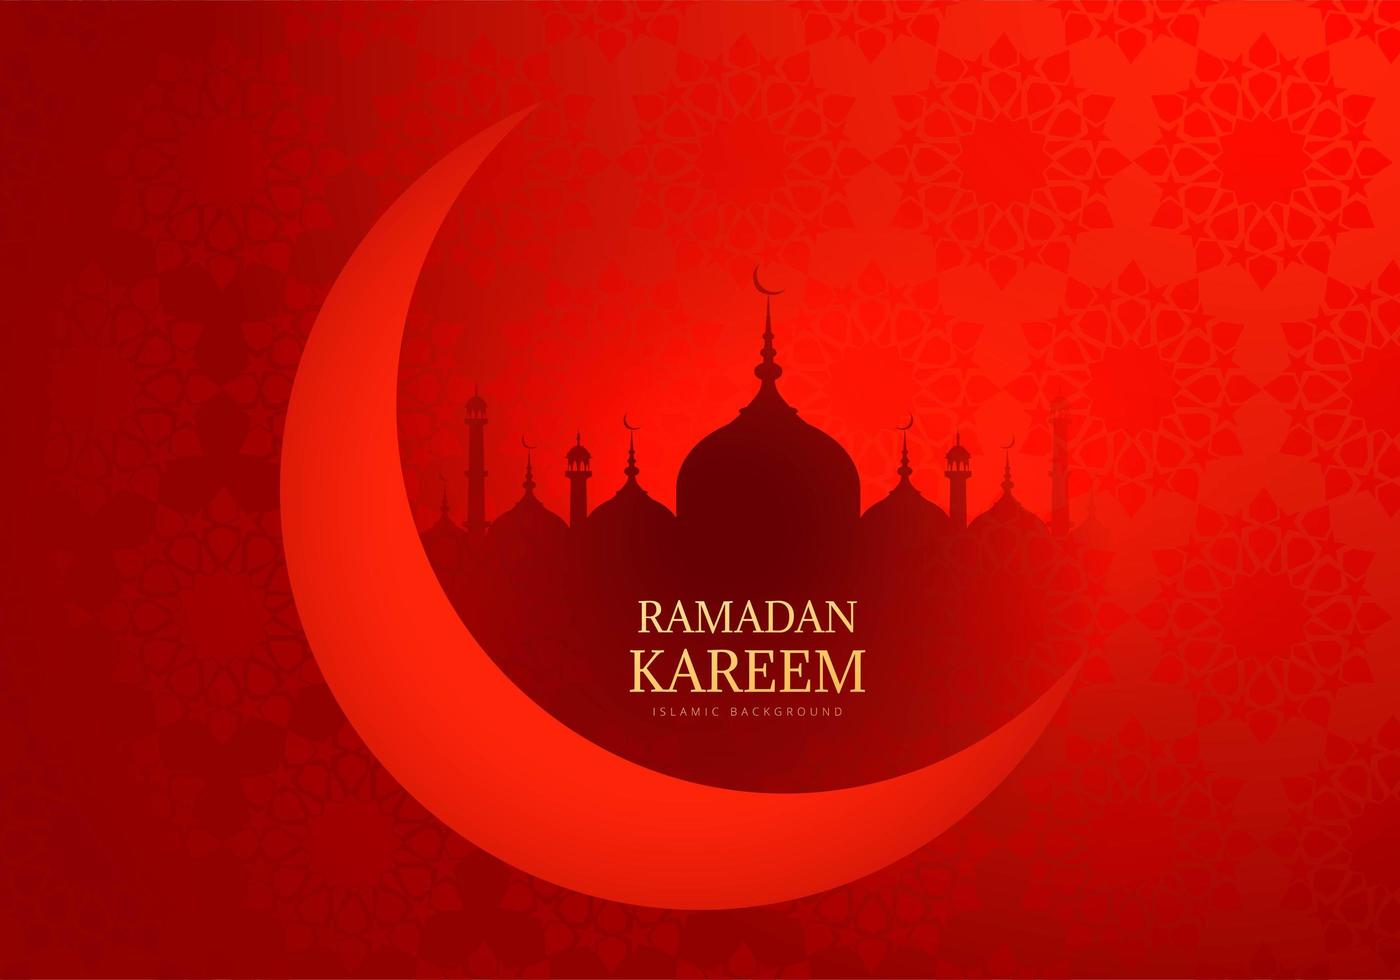 sagoma di luna e moschea ramadan kareem rosso vettore